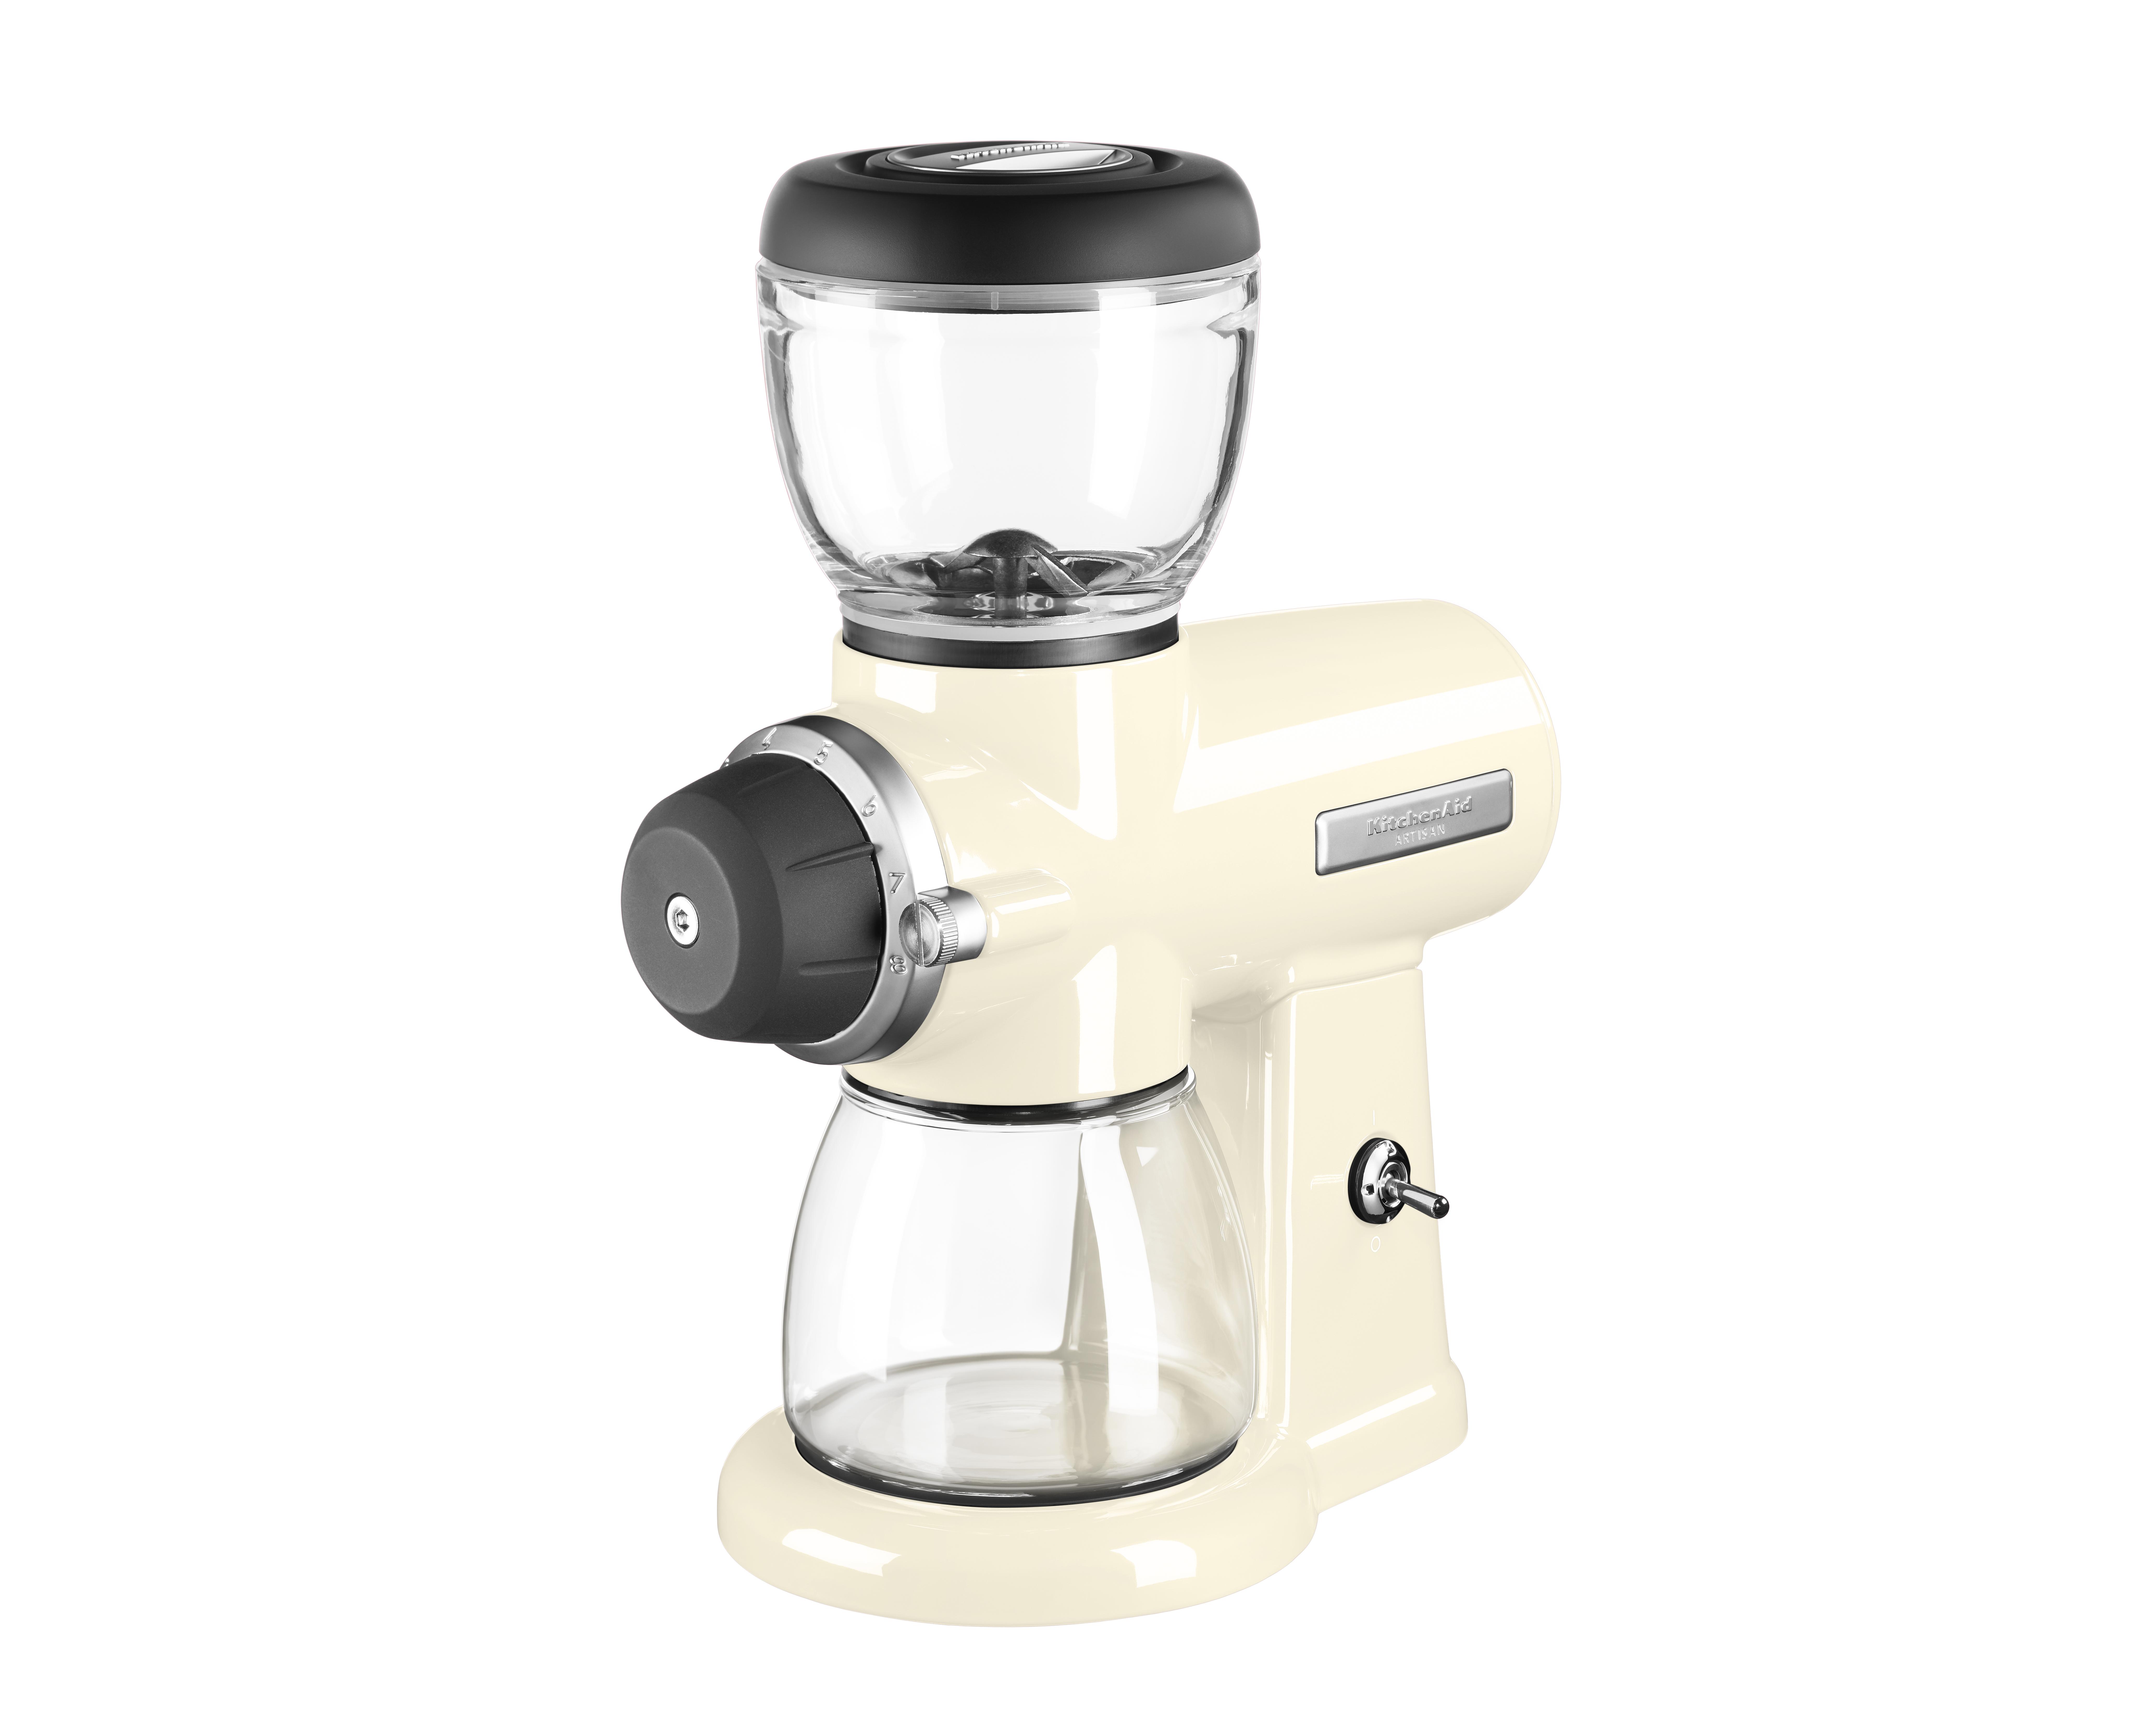 Buy Kitchenaid Artisan Coffee Grinder Cream 702eac